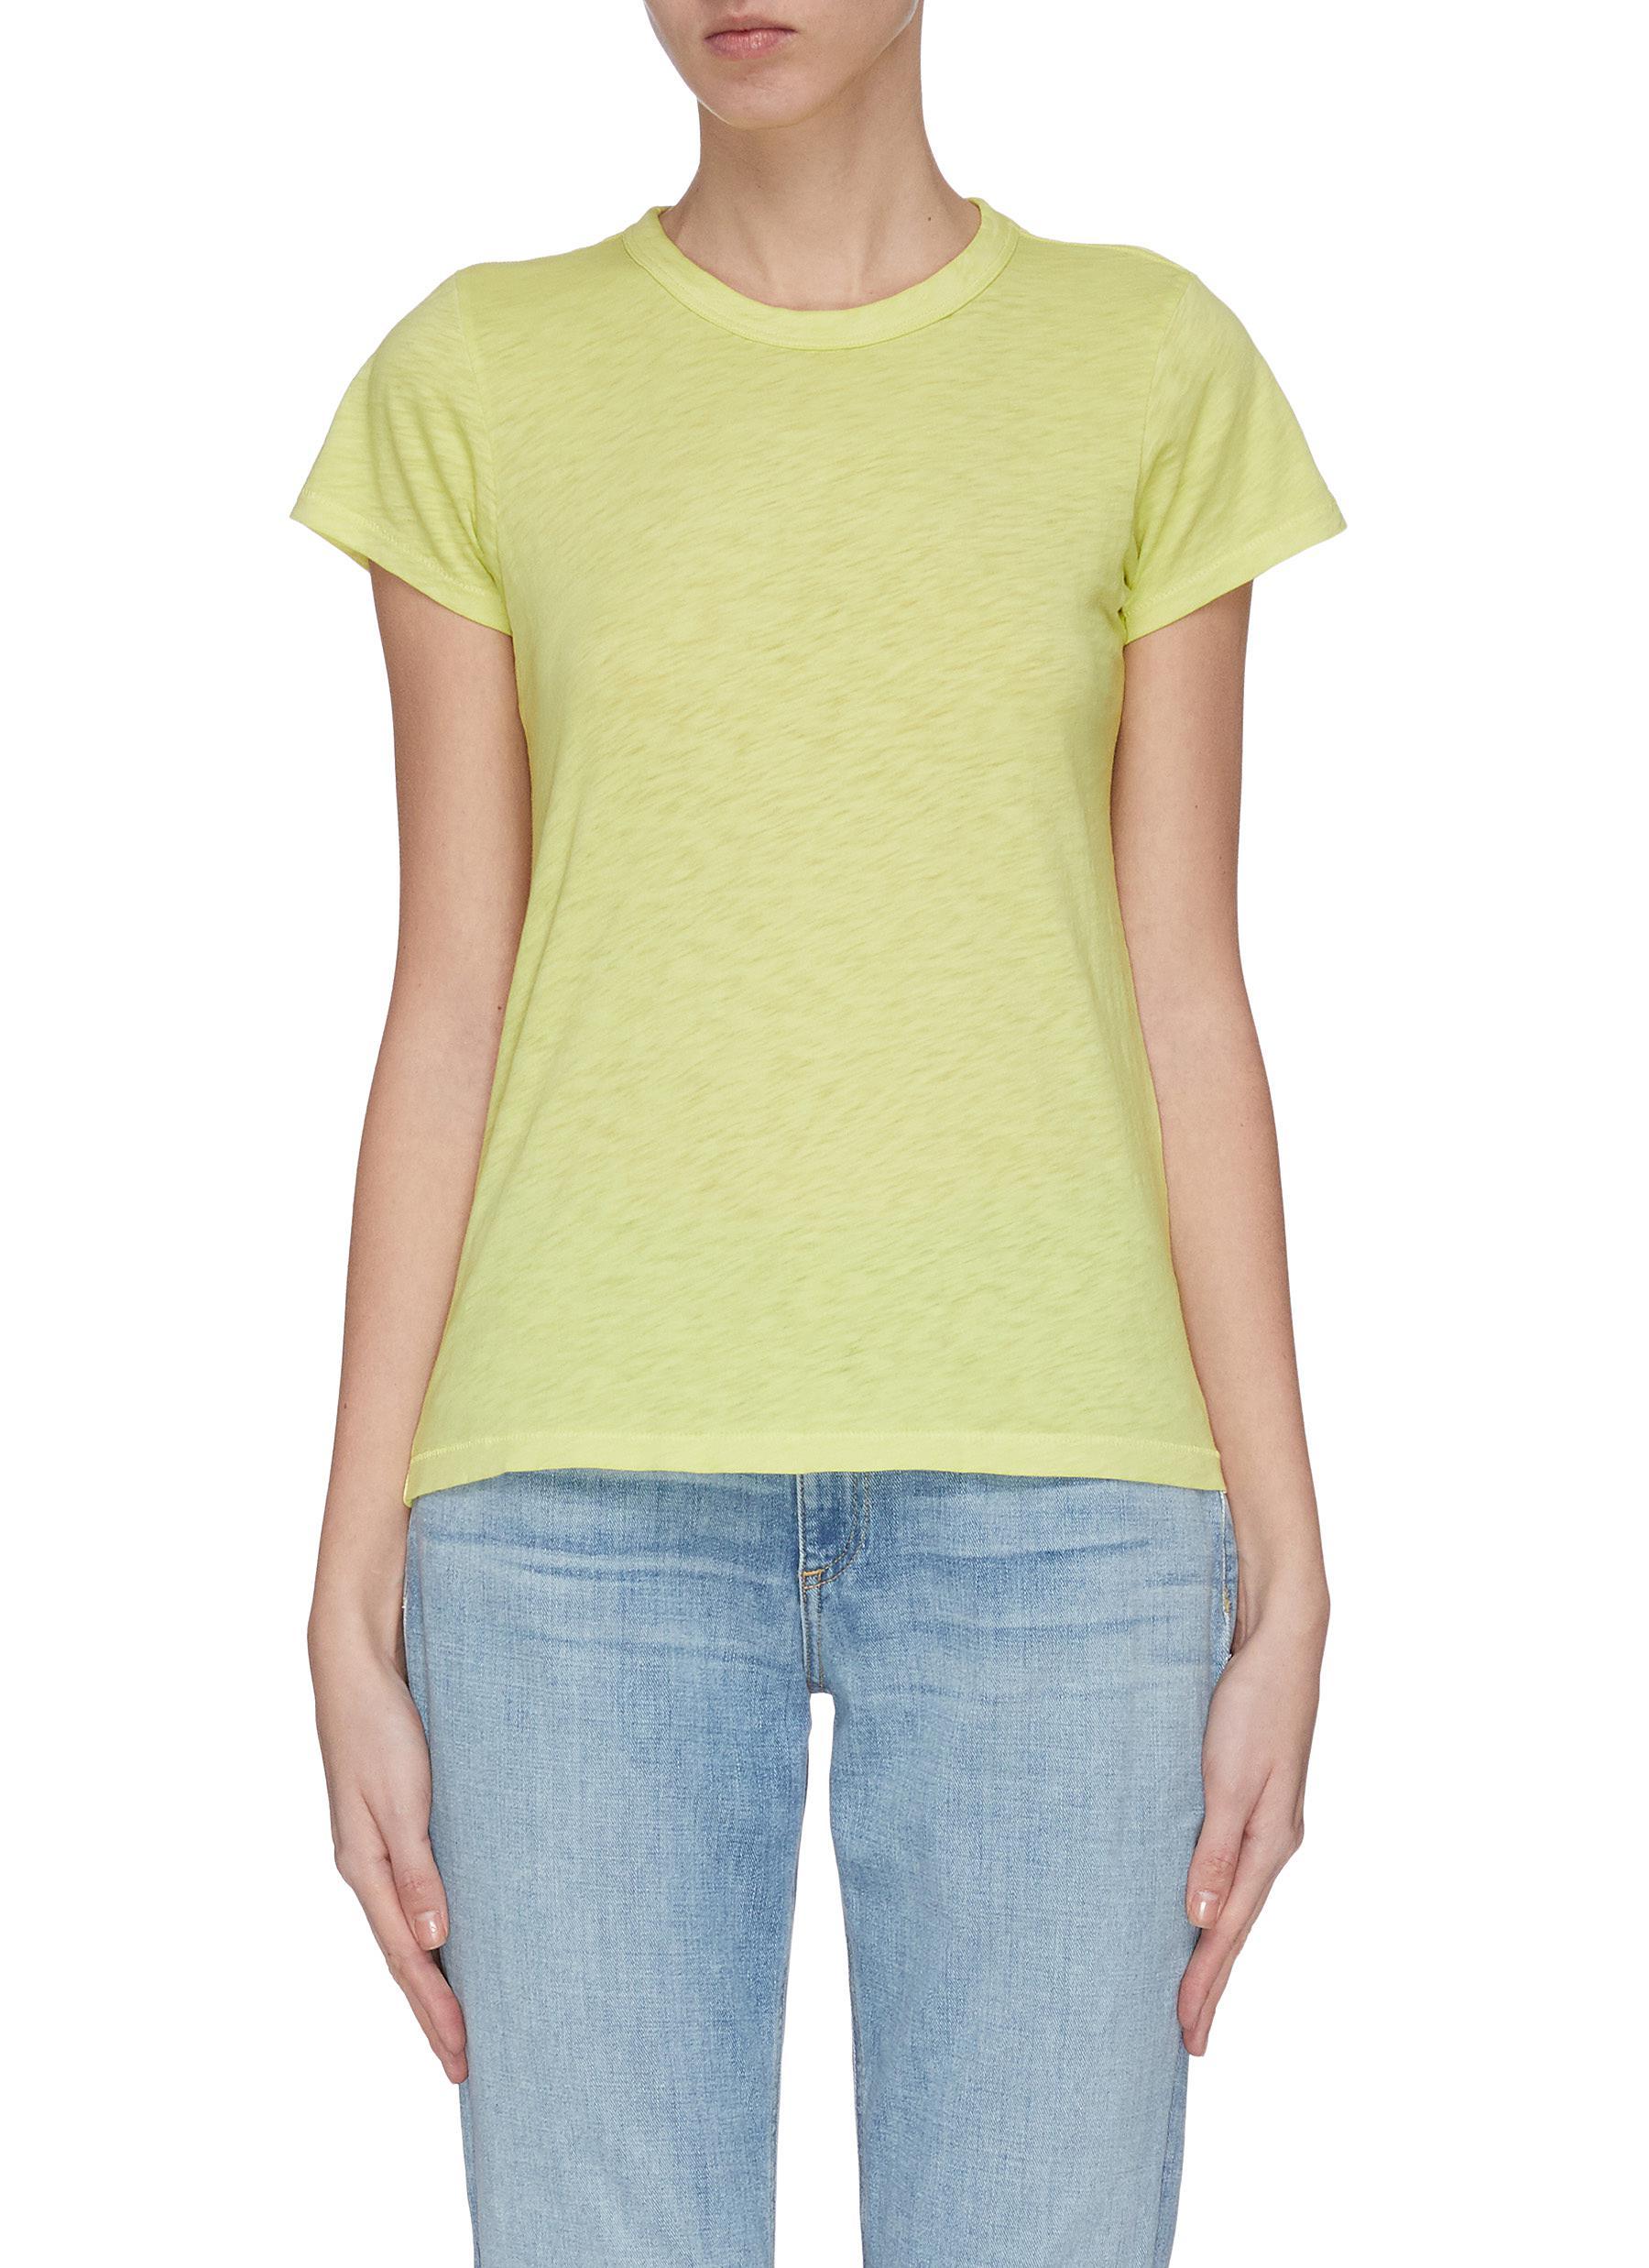 shop Rag & Bone/Jean 'The Tee' crewneck T-shirt online